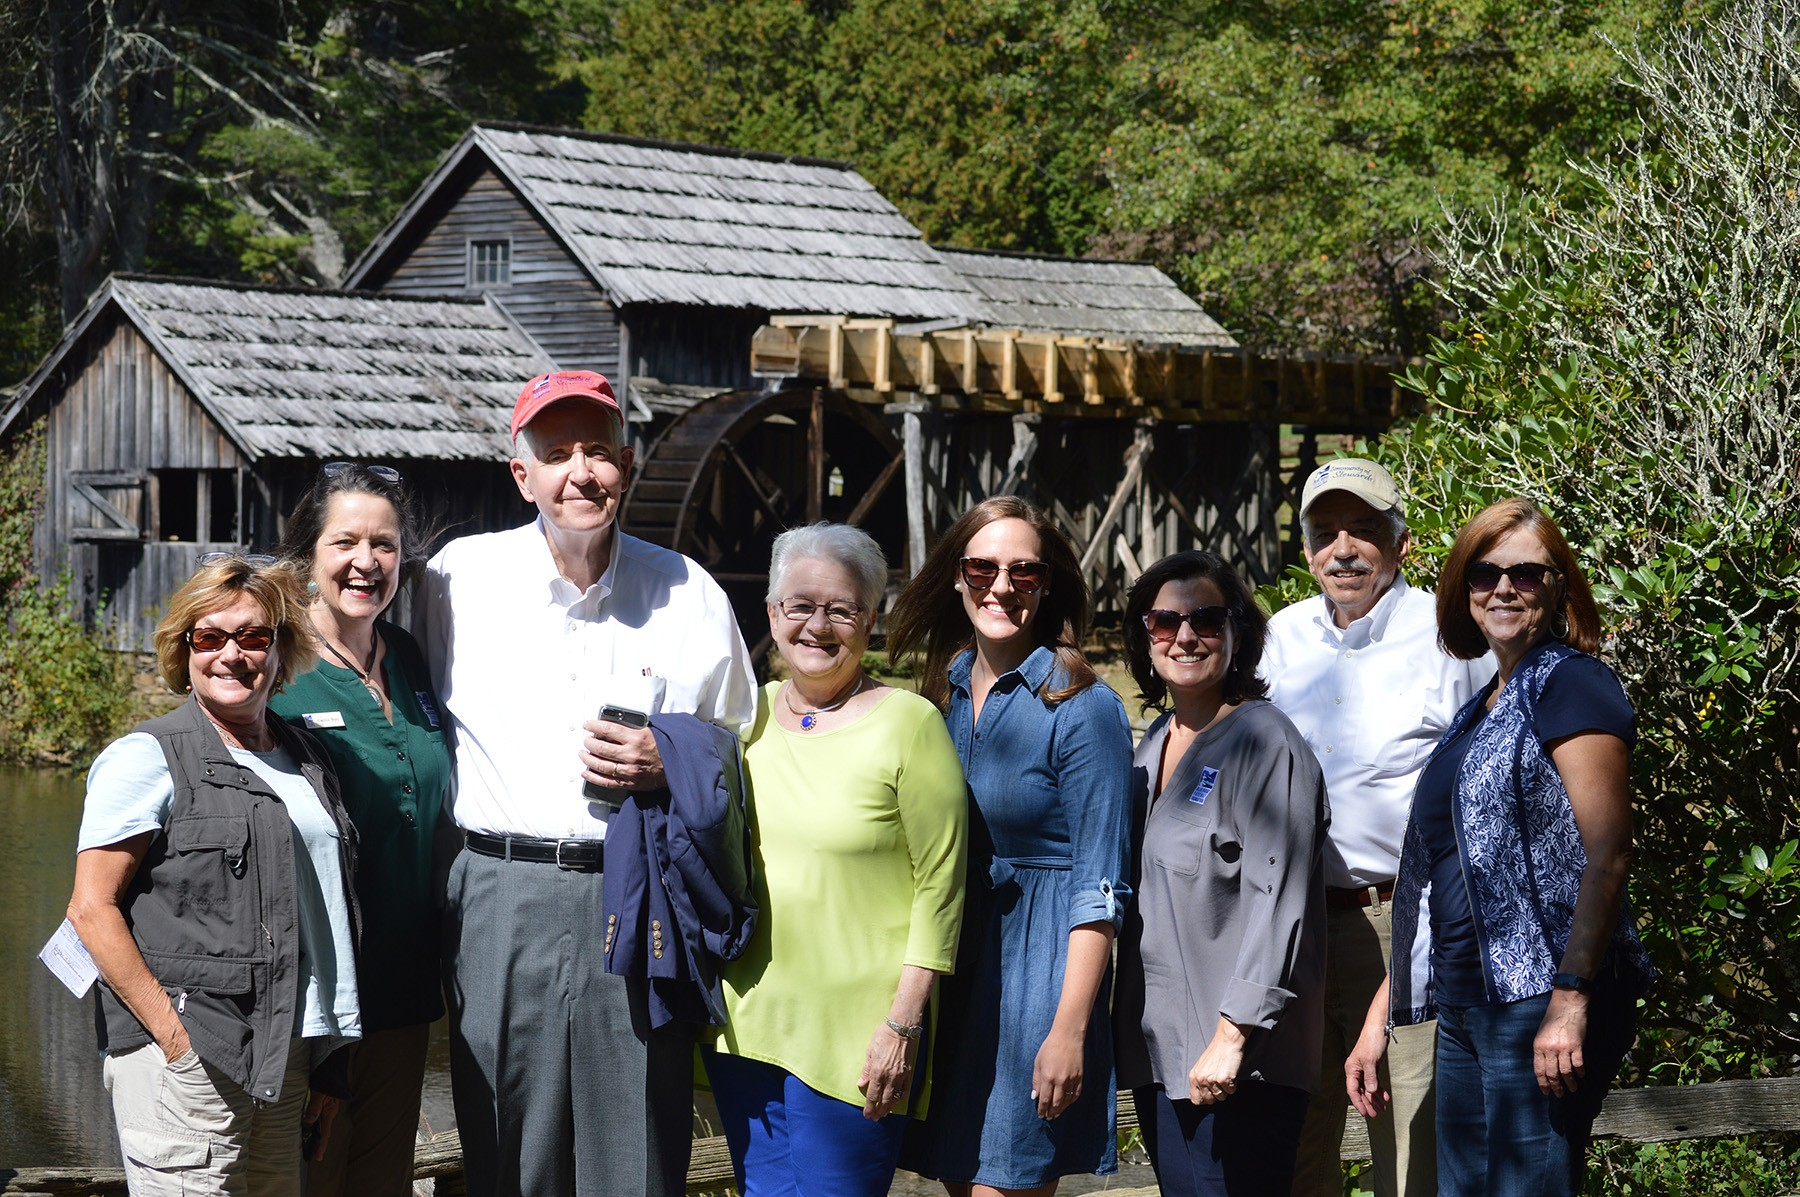 Julie Hettiger, Carolyn Ward, Bill and Cathy Stone, Madeleine Balkonis, Jordan Calaway, Rick Lotz, and Willa Mays atMabryMillribbon cutting event on October 3.